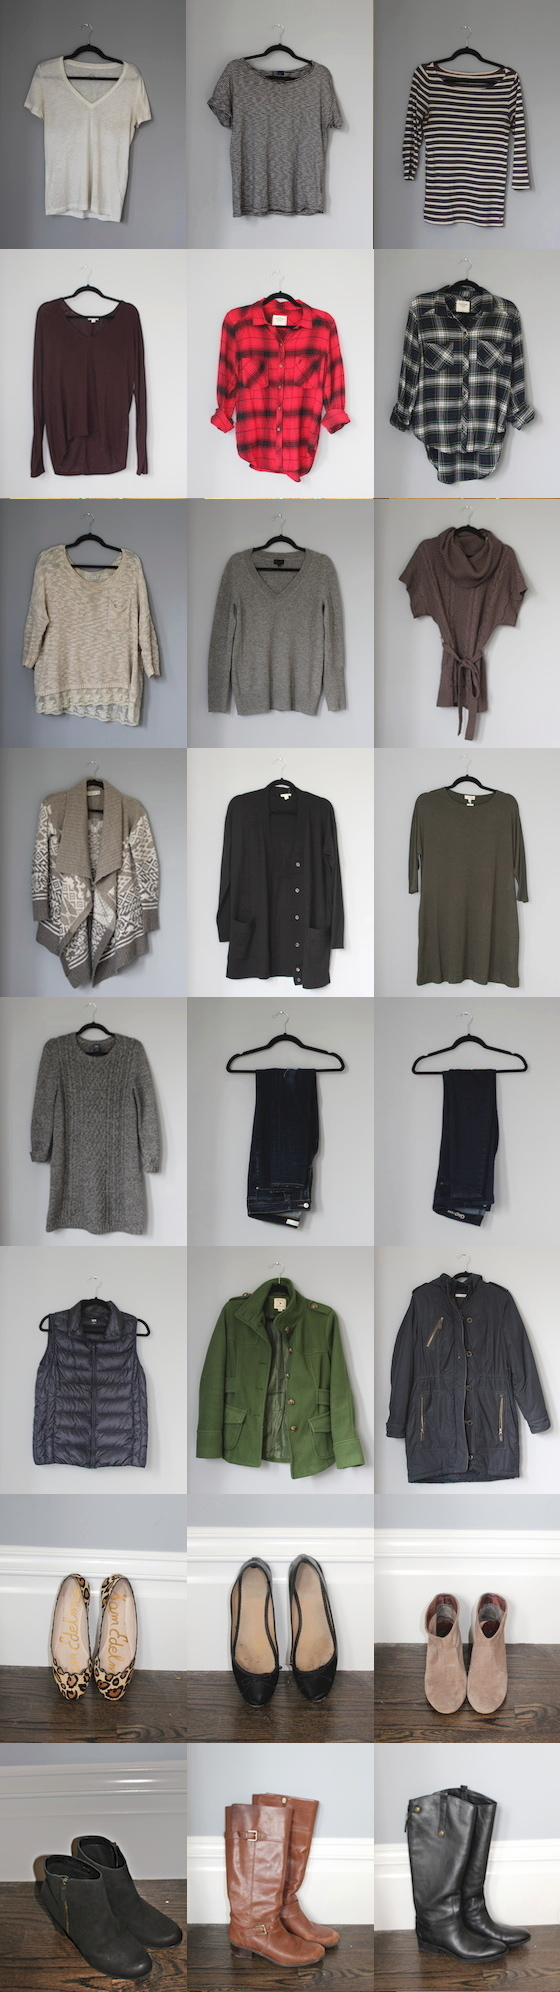 My Winter 2015 Capsule Wardrobe | Glitter & Grace Blog #capsule #minimalism #capsulewardrobe